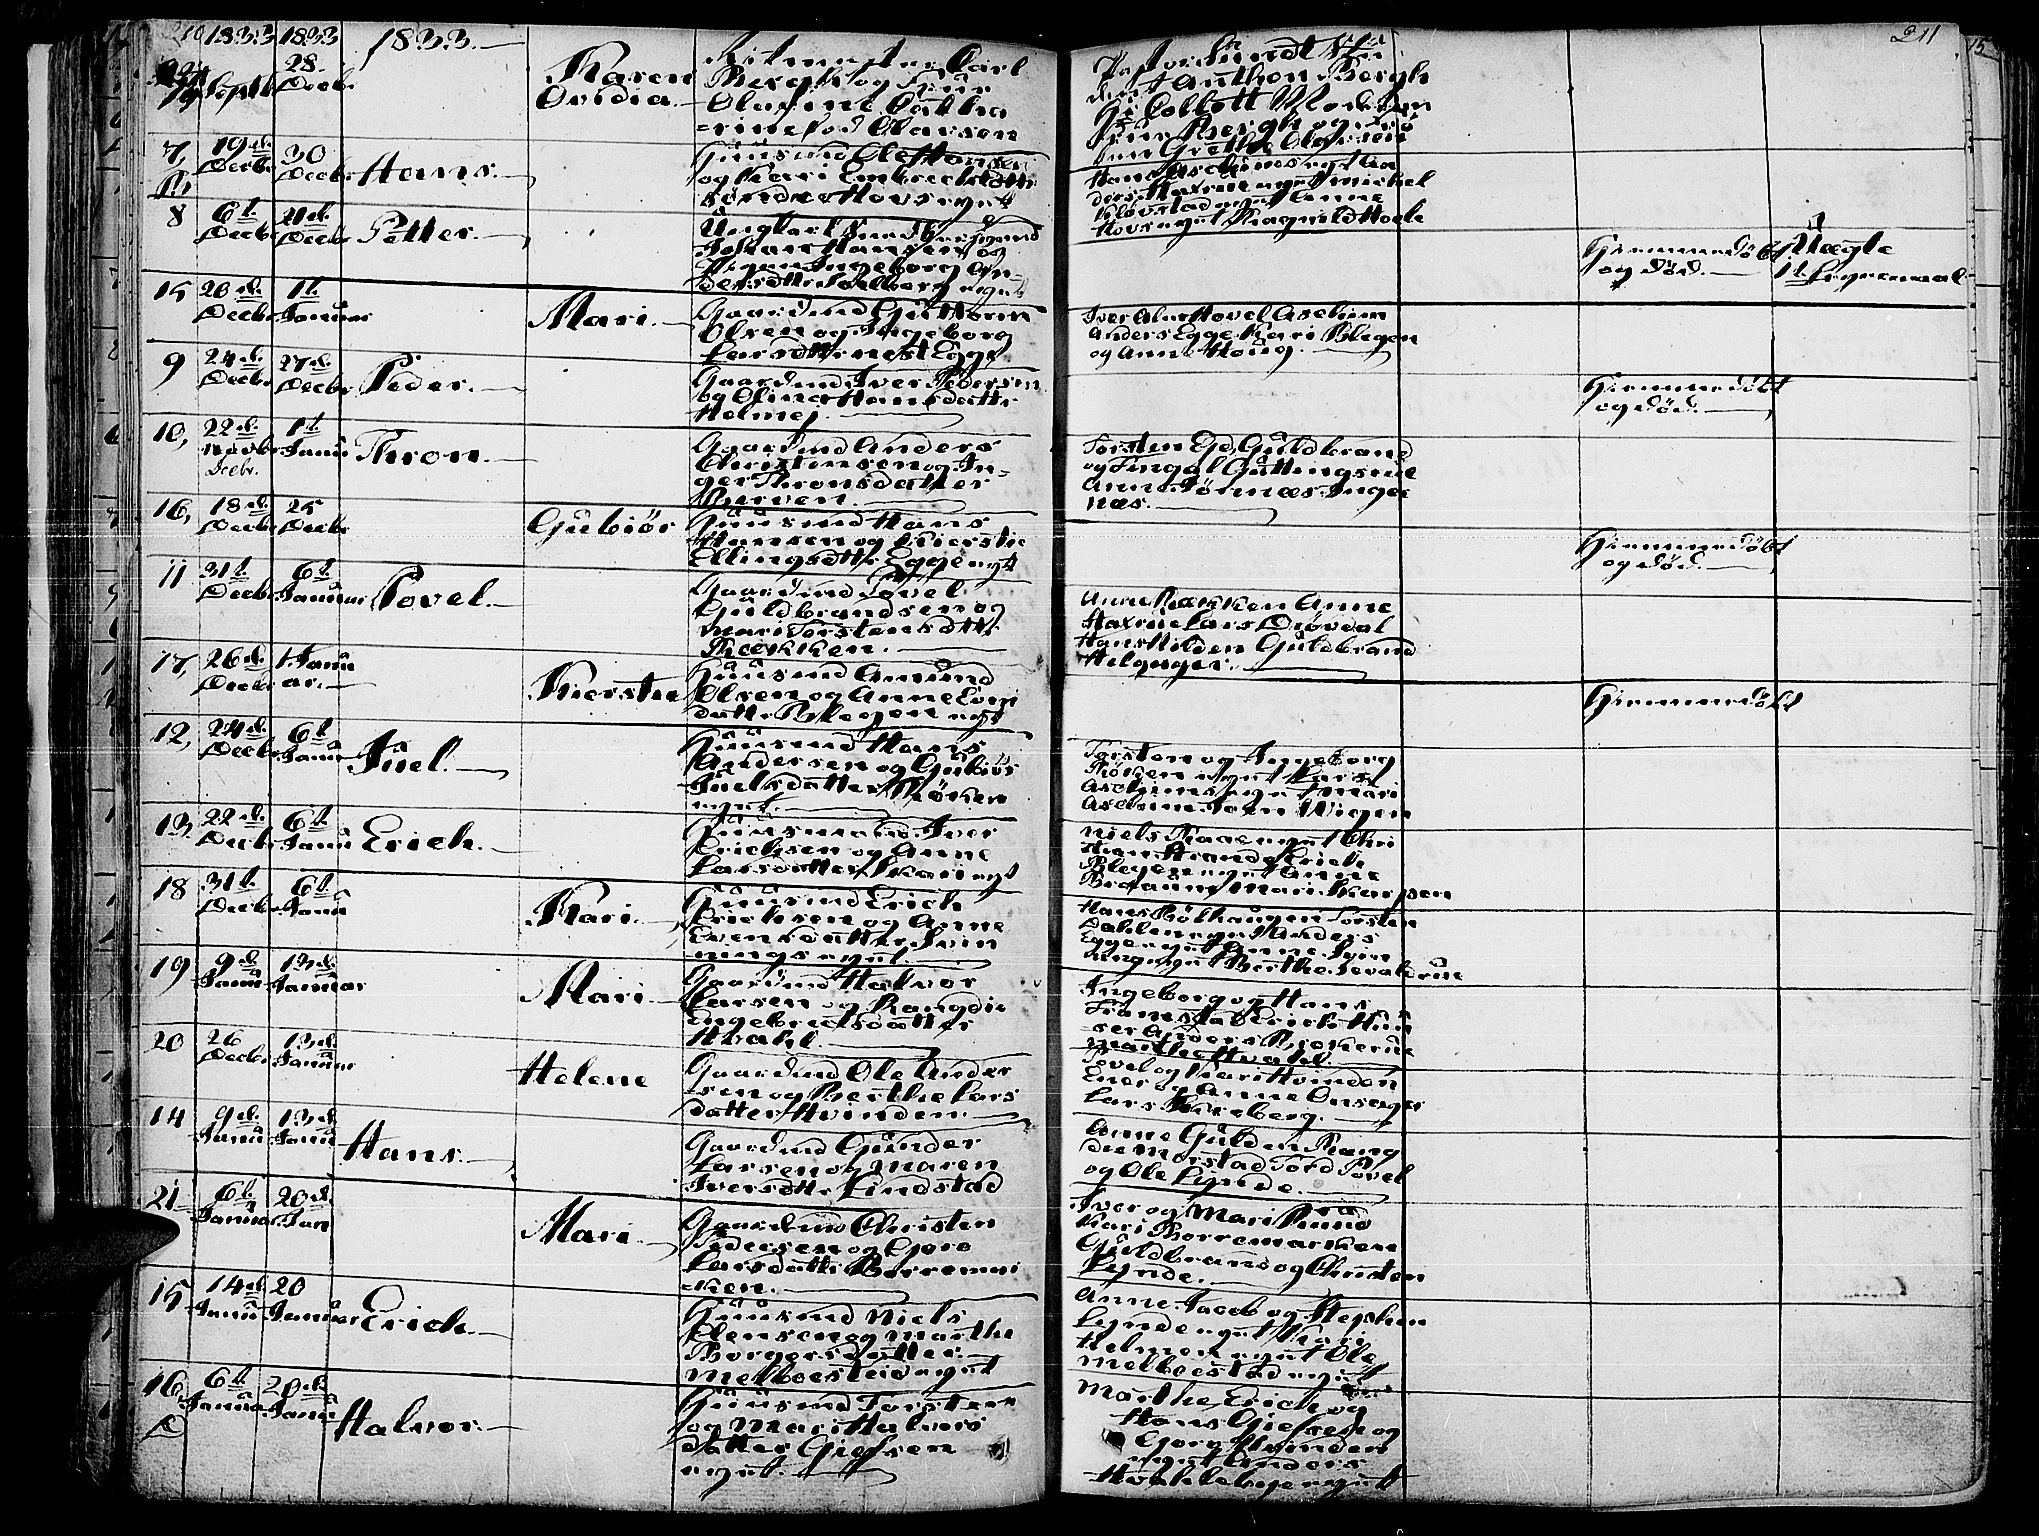 SAH, Gran prestekontor, Ministerialbok nr. 10, 1824-1842, s. 210-211